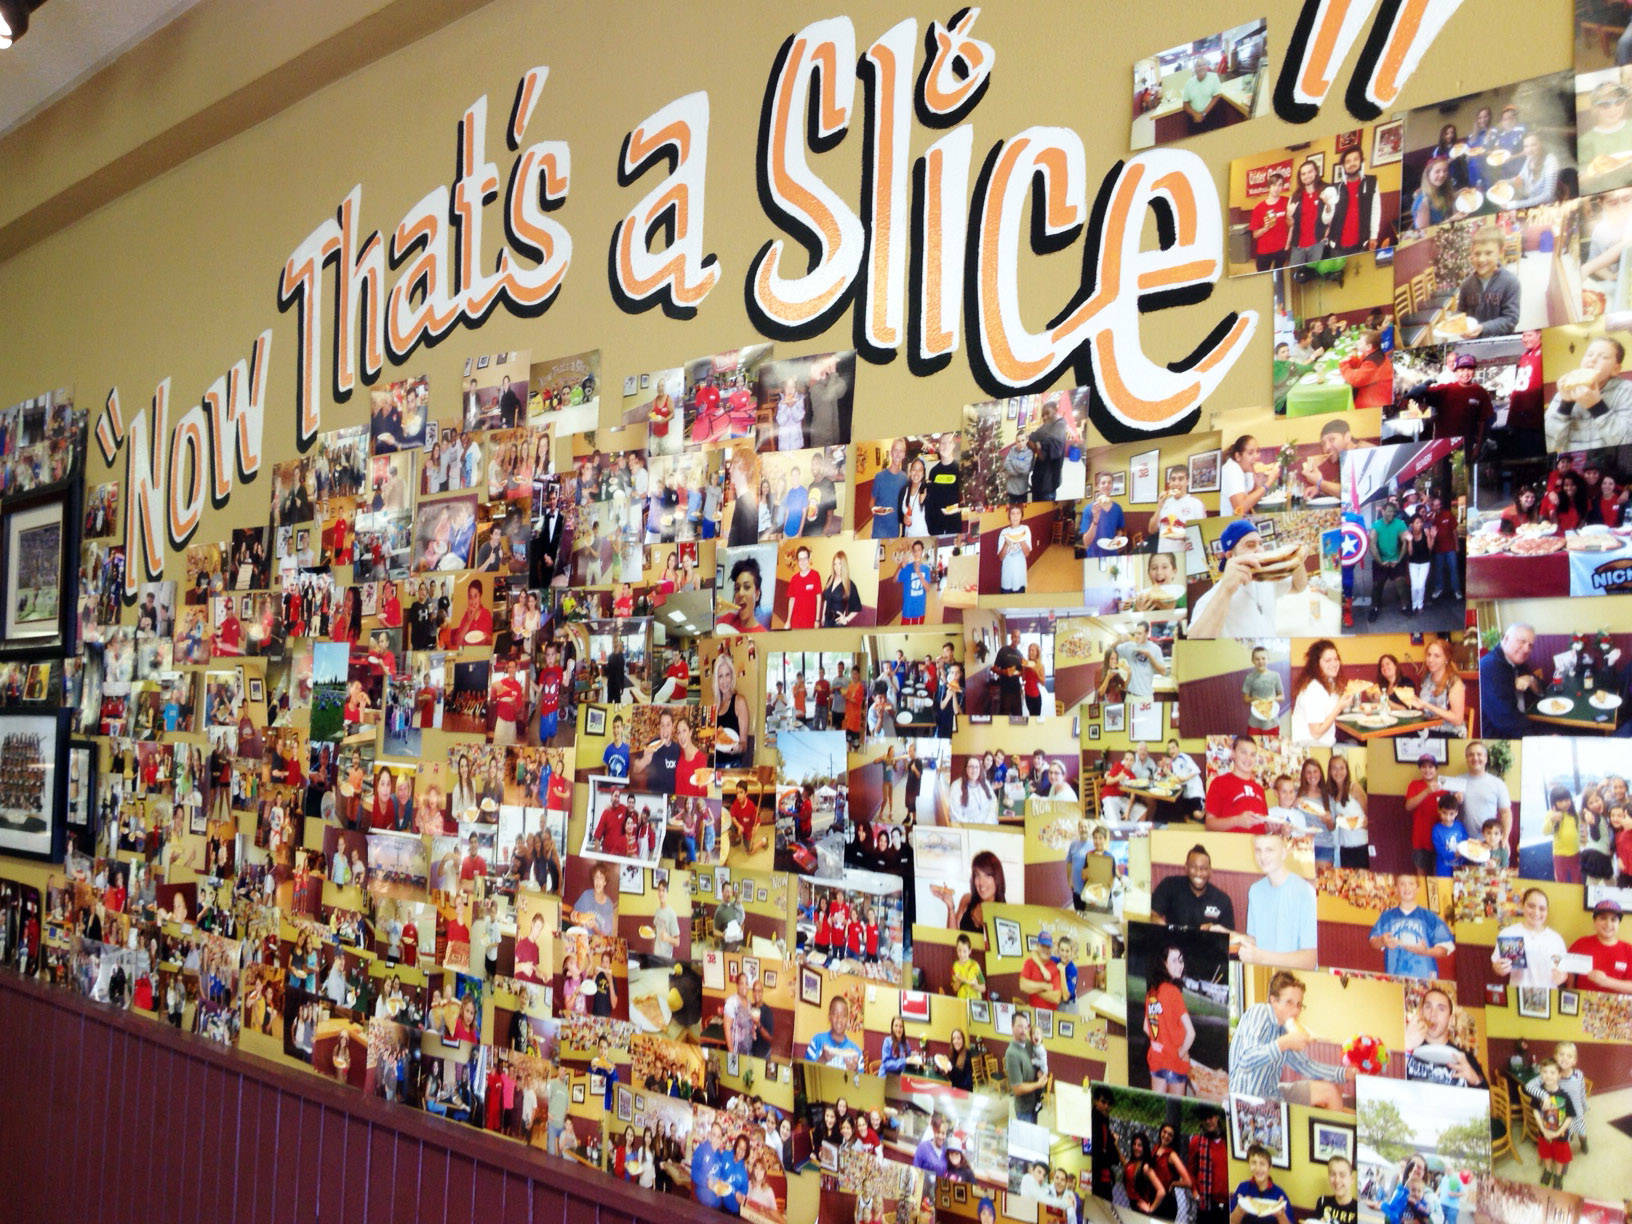 e720d4f2f47e19f2bf1c_A_Slice_of_Life_wall_at_Nicks.jpg